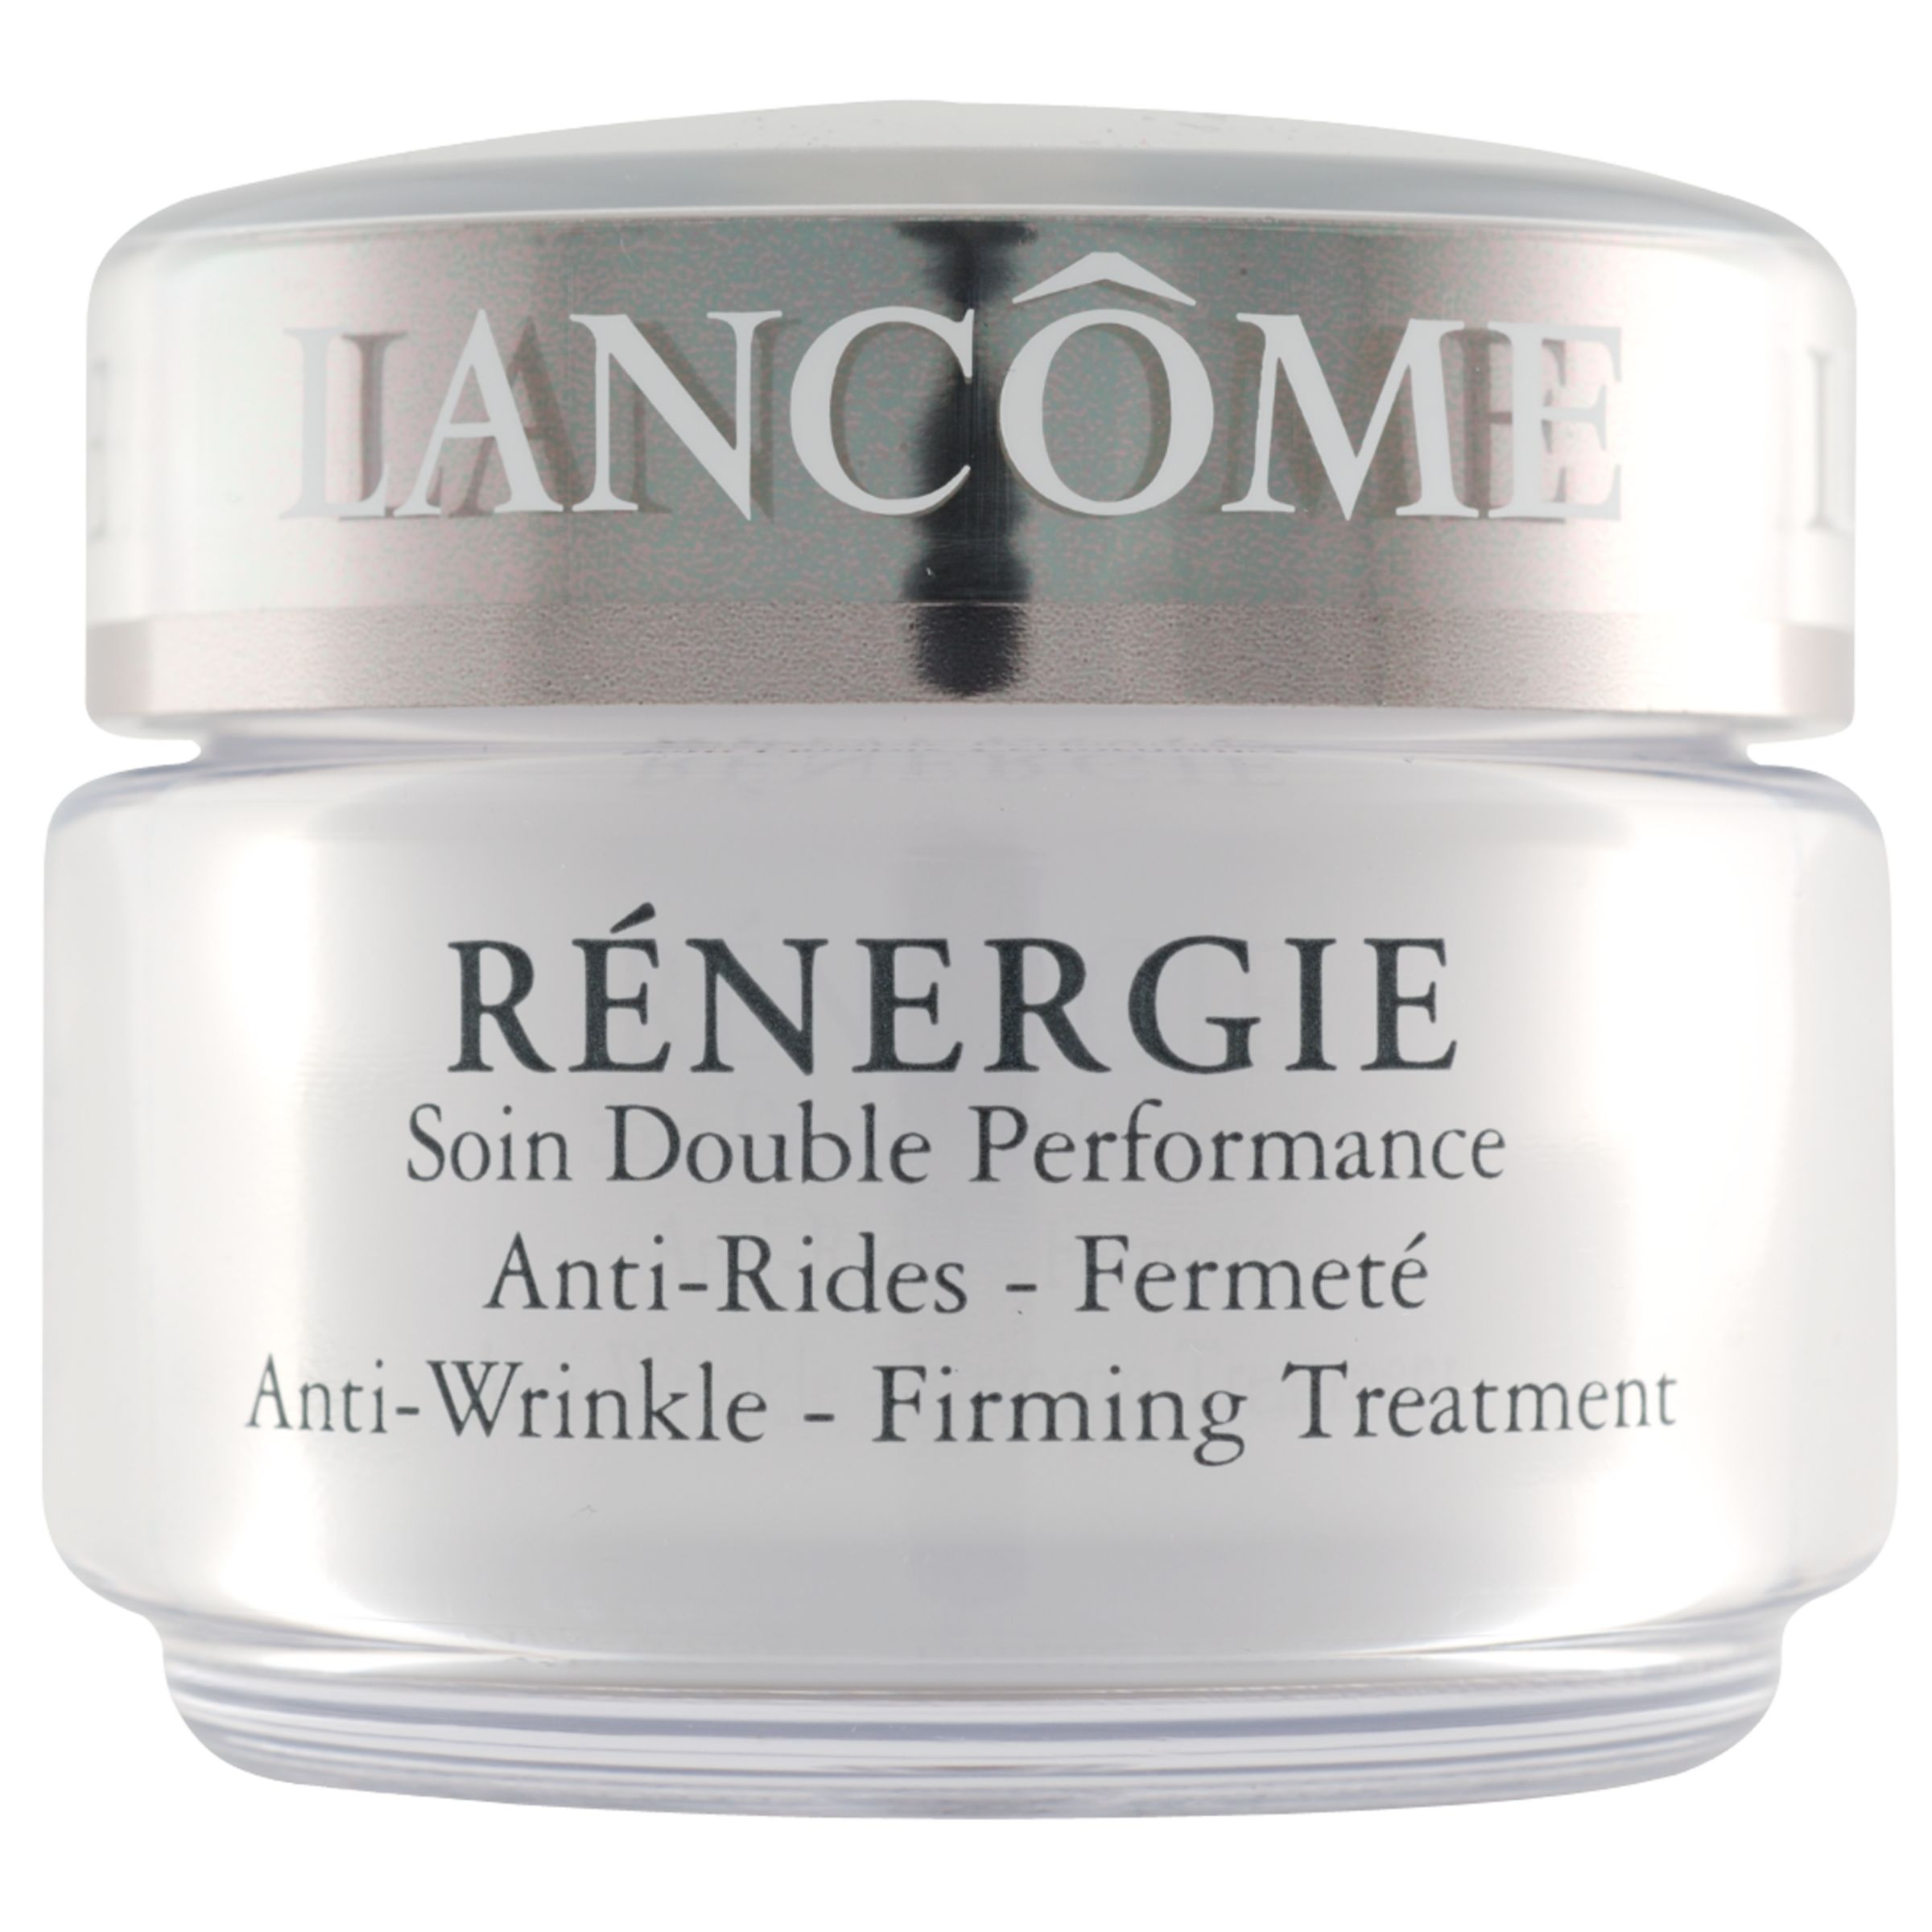 Lancome Lancôme Rénergie Jar, 50ml